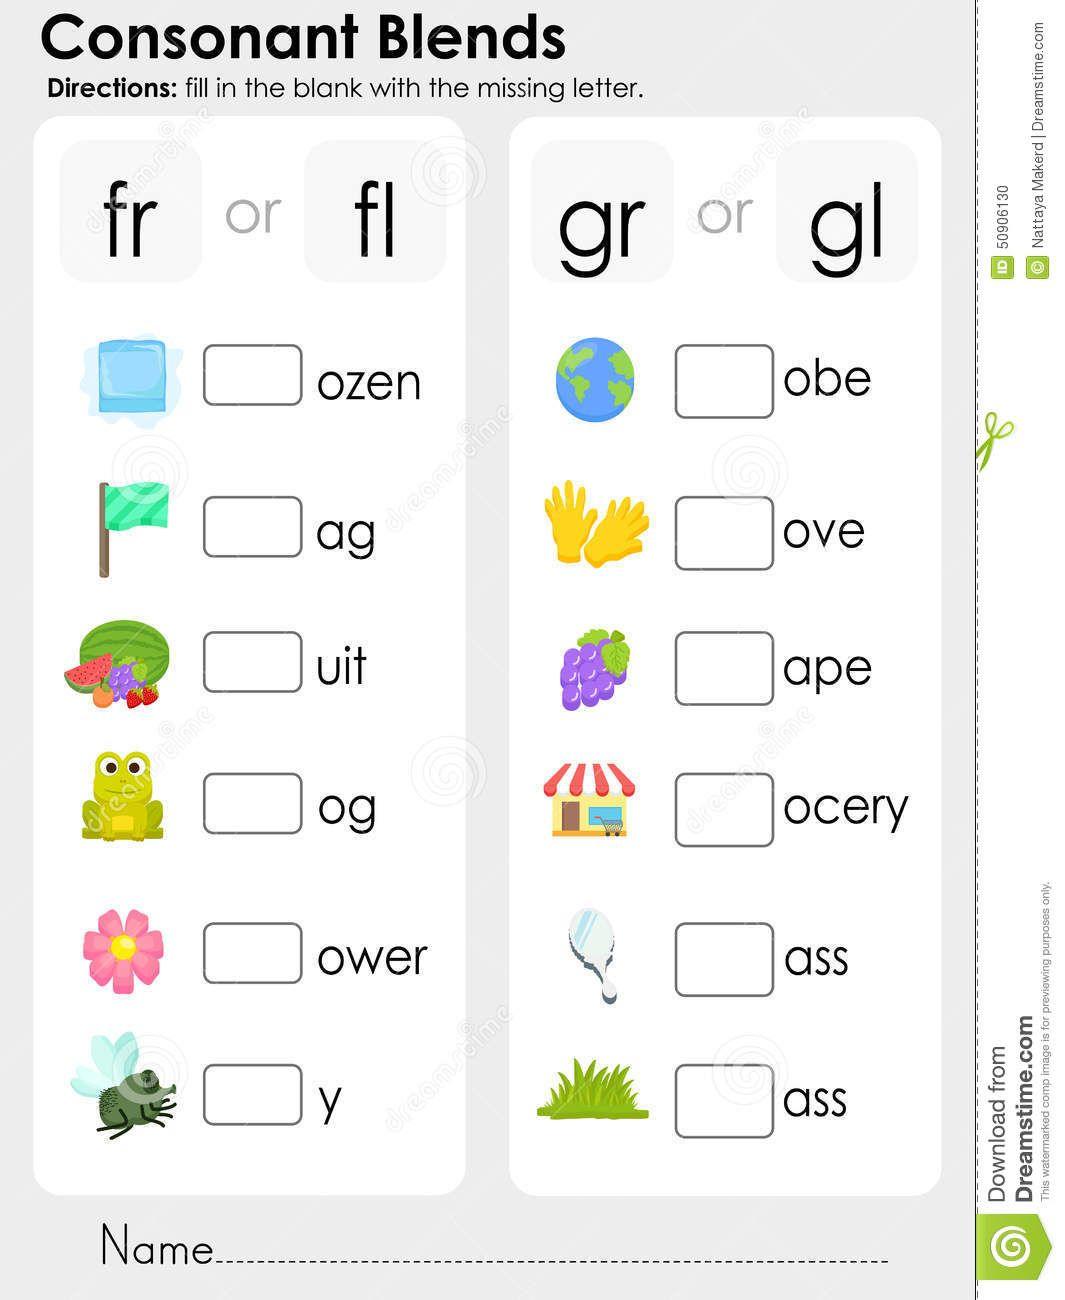 hight resolution of Consonant Blends Worksheets Pdf - Letter